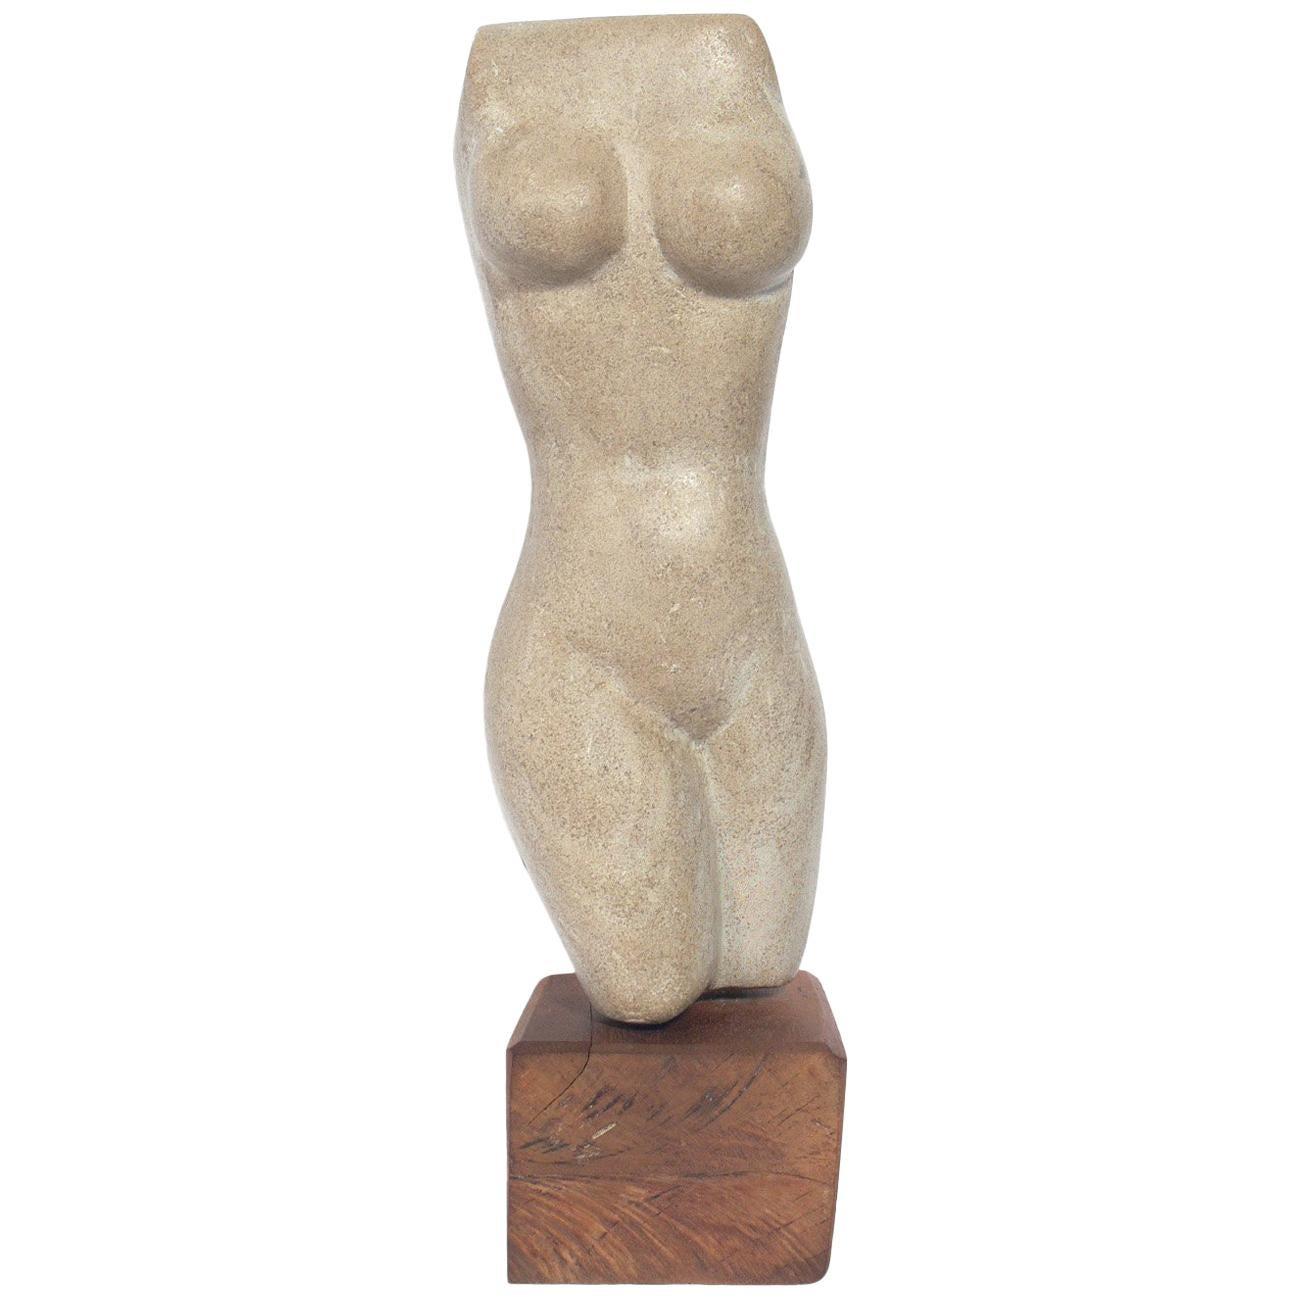 Female Nude Stone Sculpture